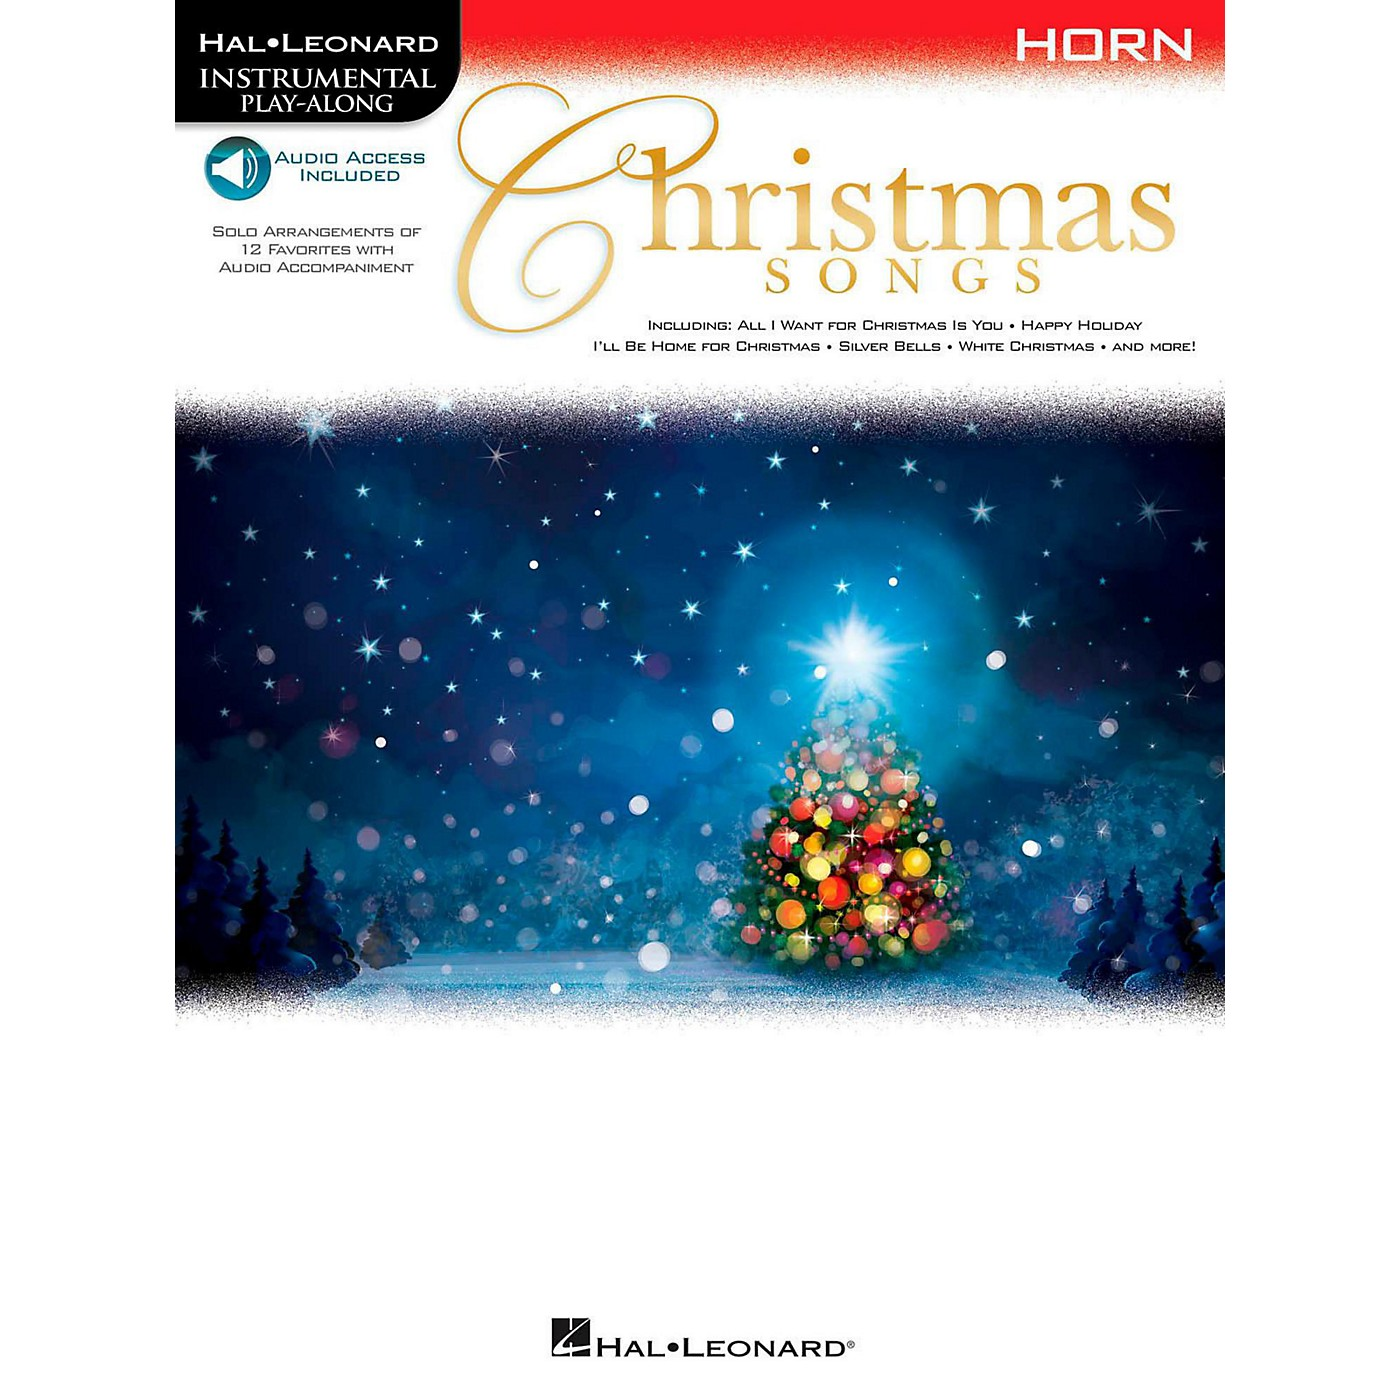 Hal Leonard Christmas Songs For Horn - Instrumental Play-Along (Book/Audio On-Line) thumbnail